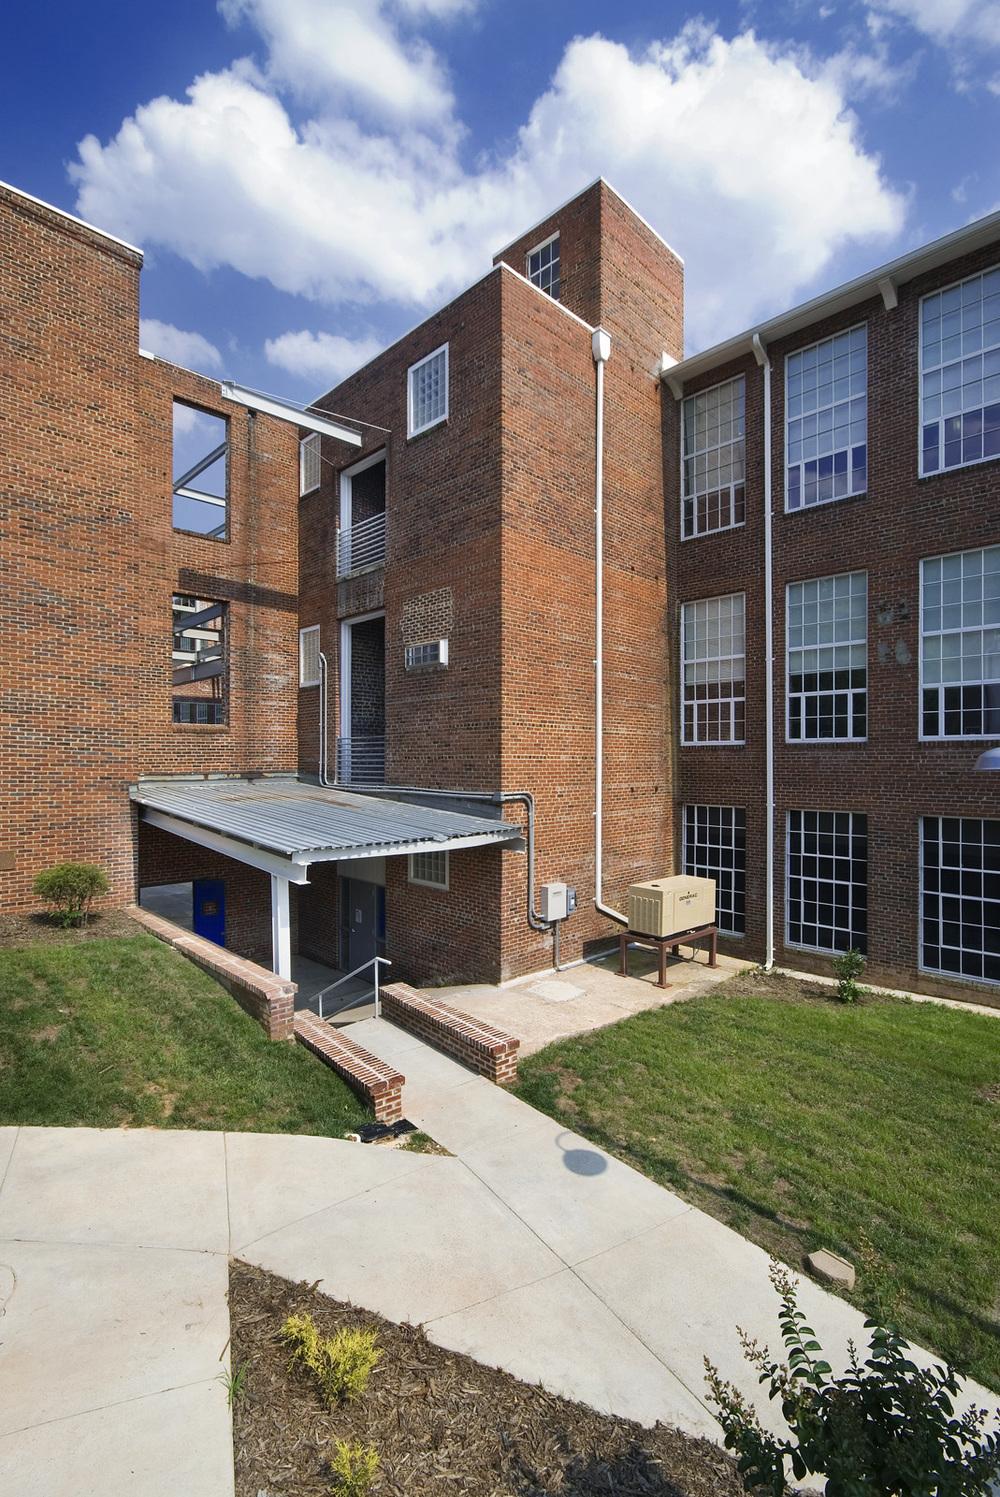 Rivermill Apts exteriors 06 045.jpg